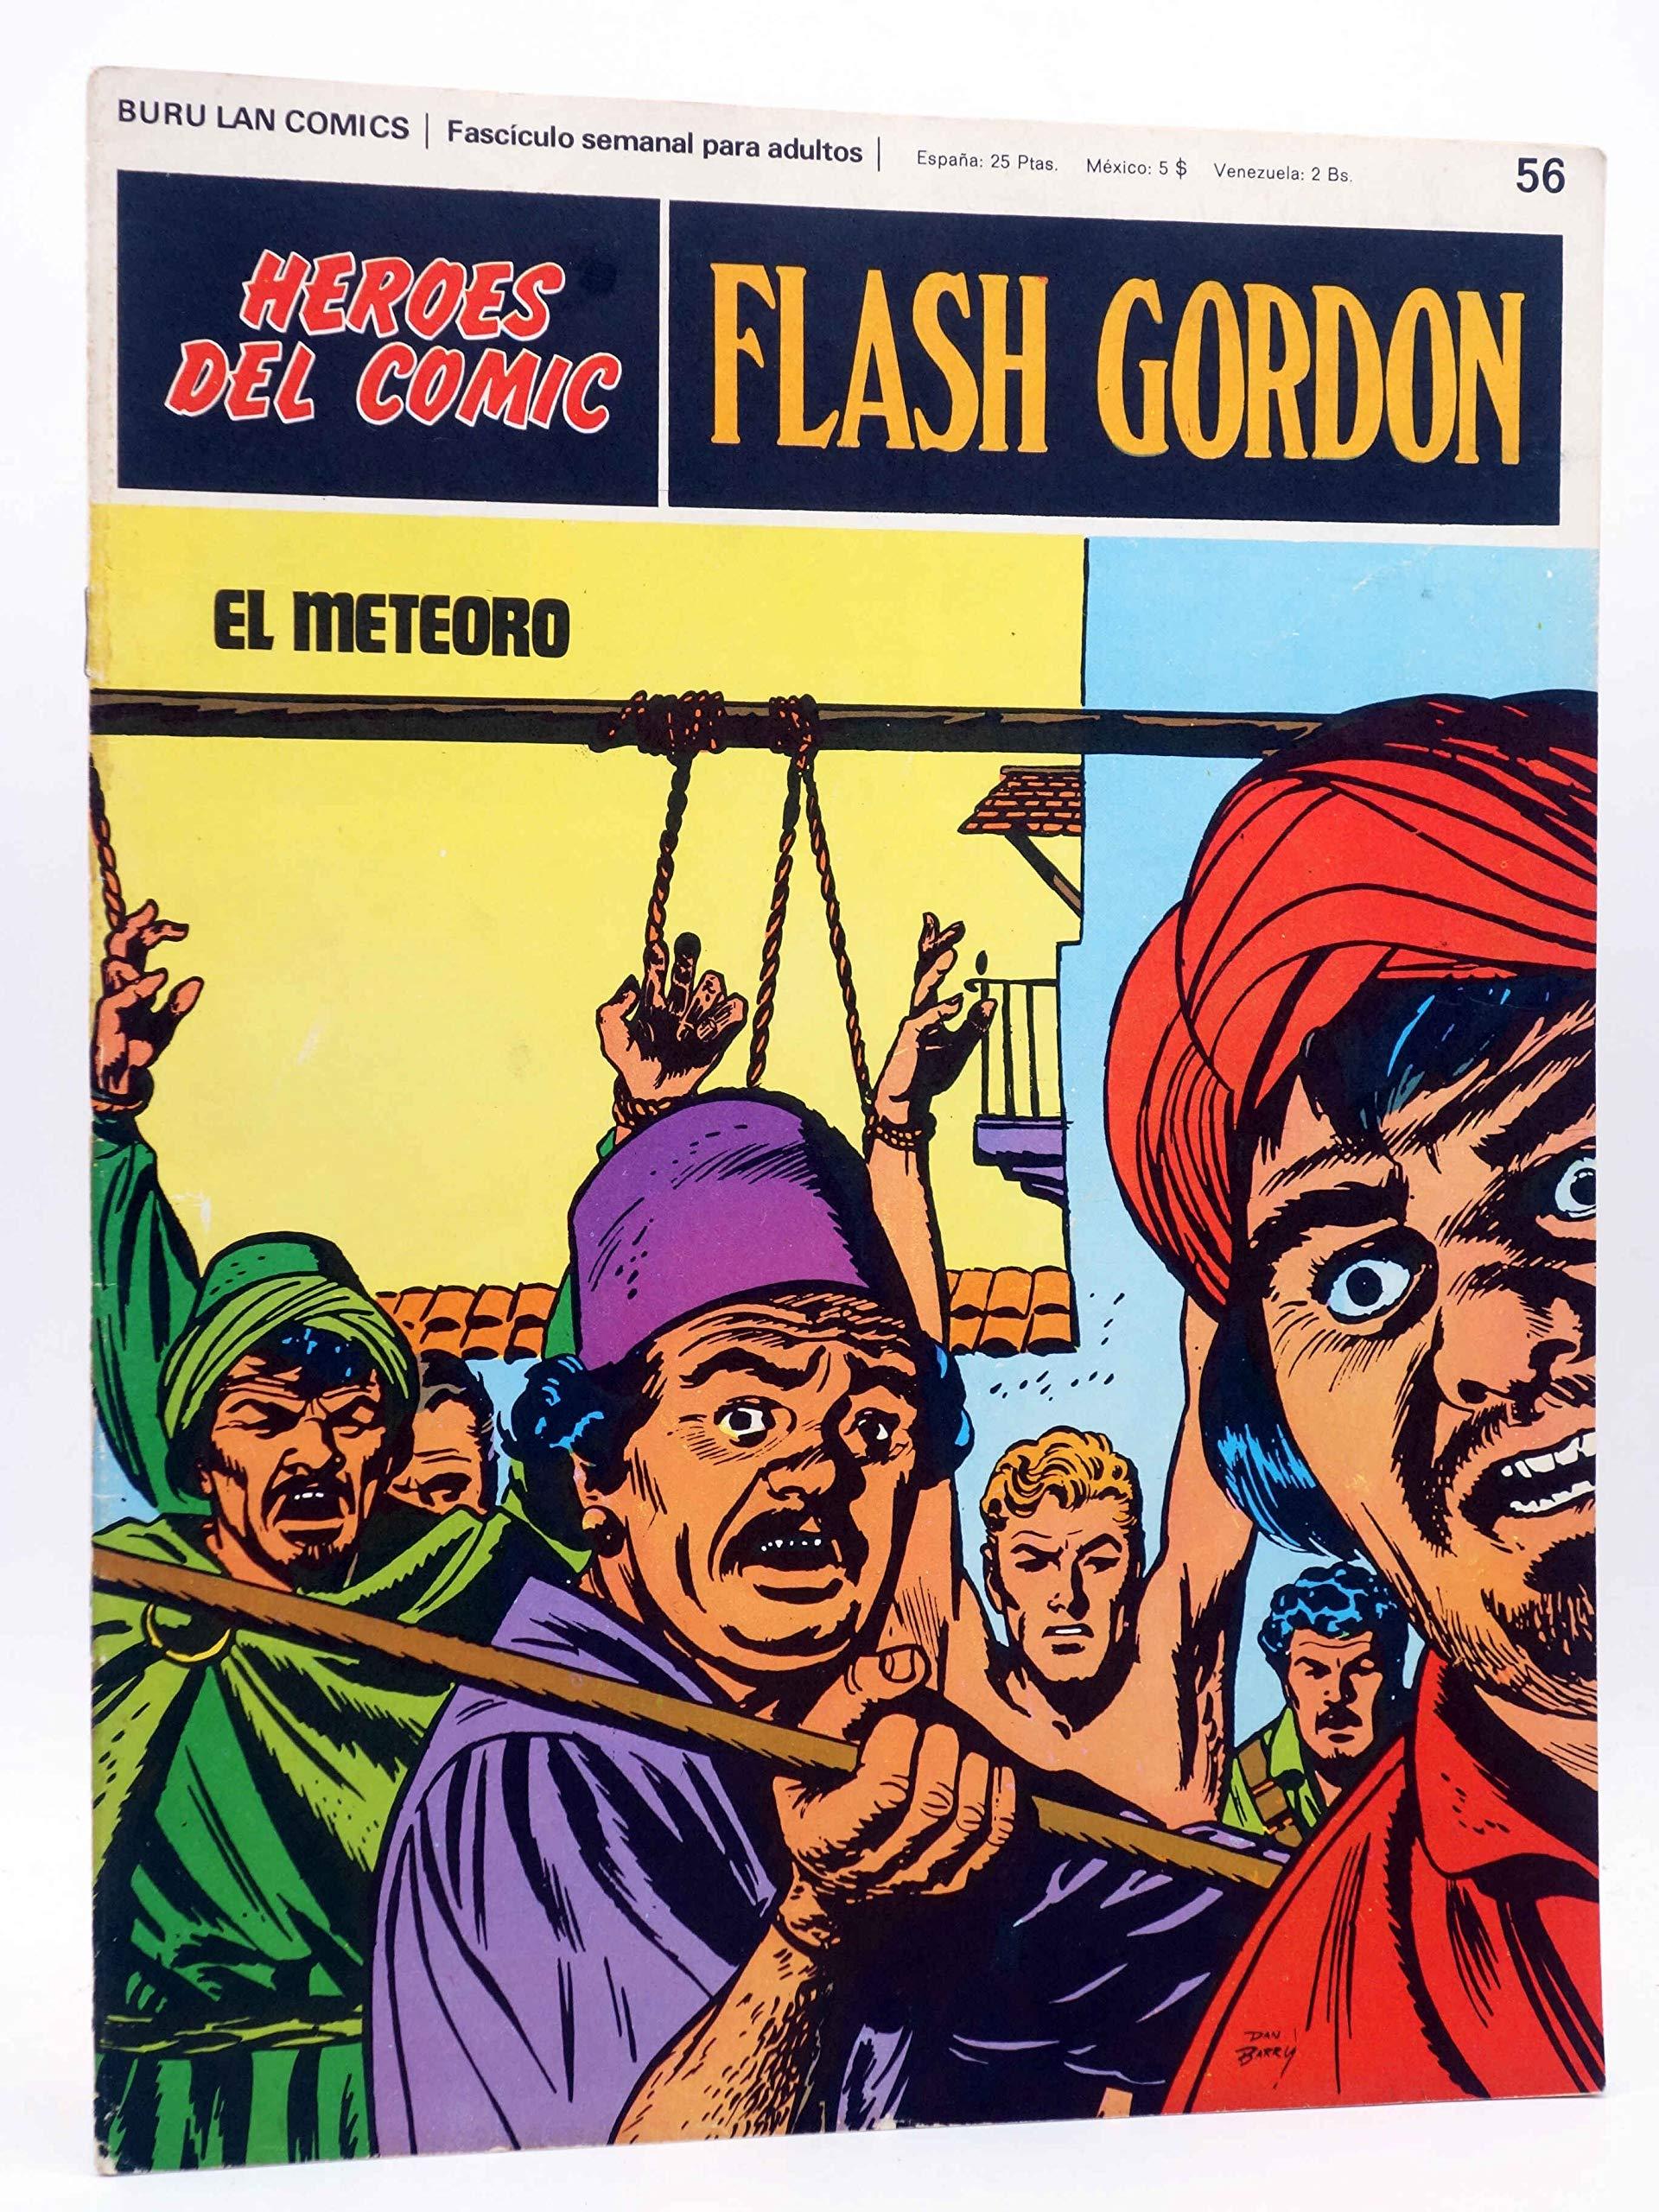 HEROES DEL COMIC. FLASH GORDON 56. El Meteoro. Burulan Buru Lan: Amazon.es: Alex Raymond: Libros